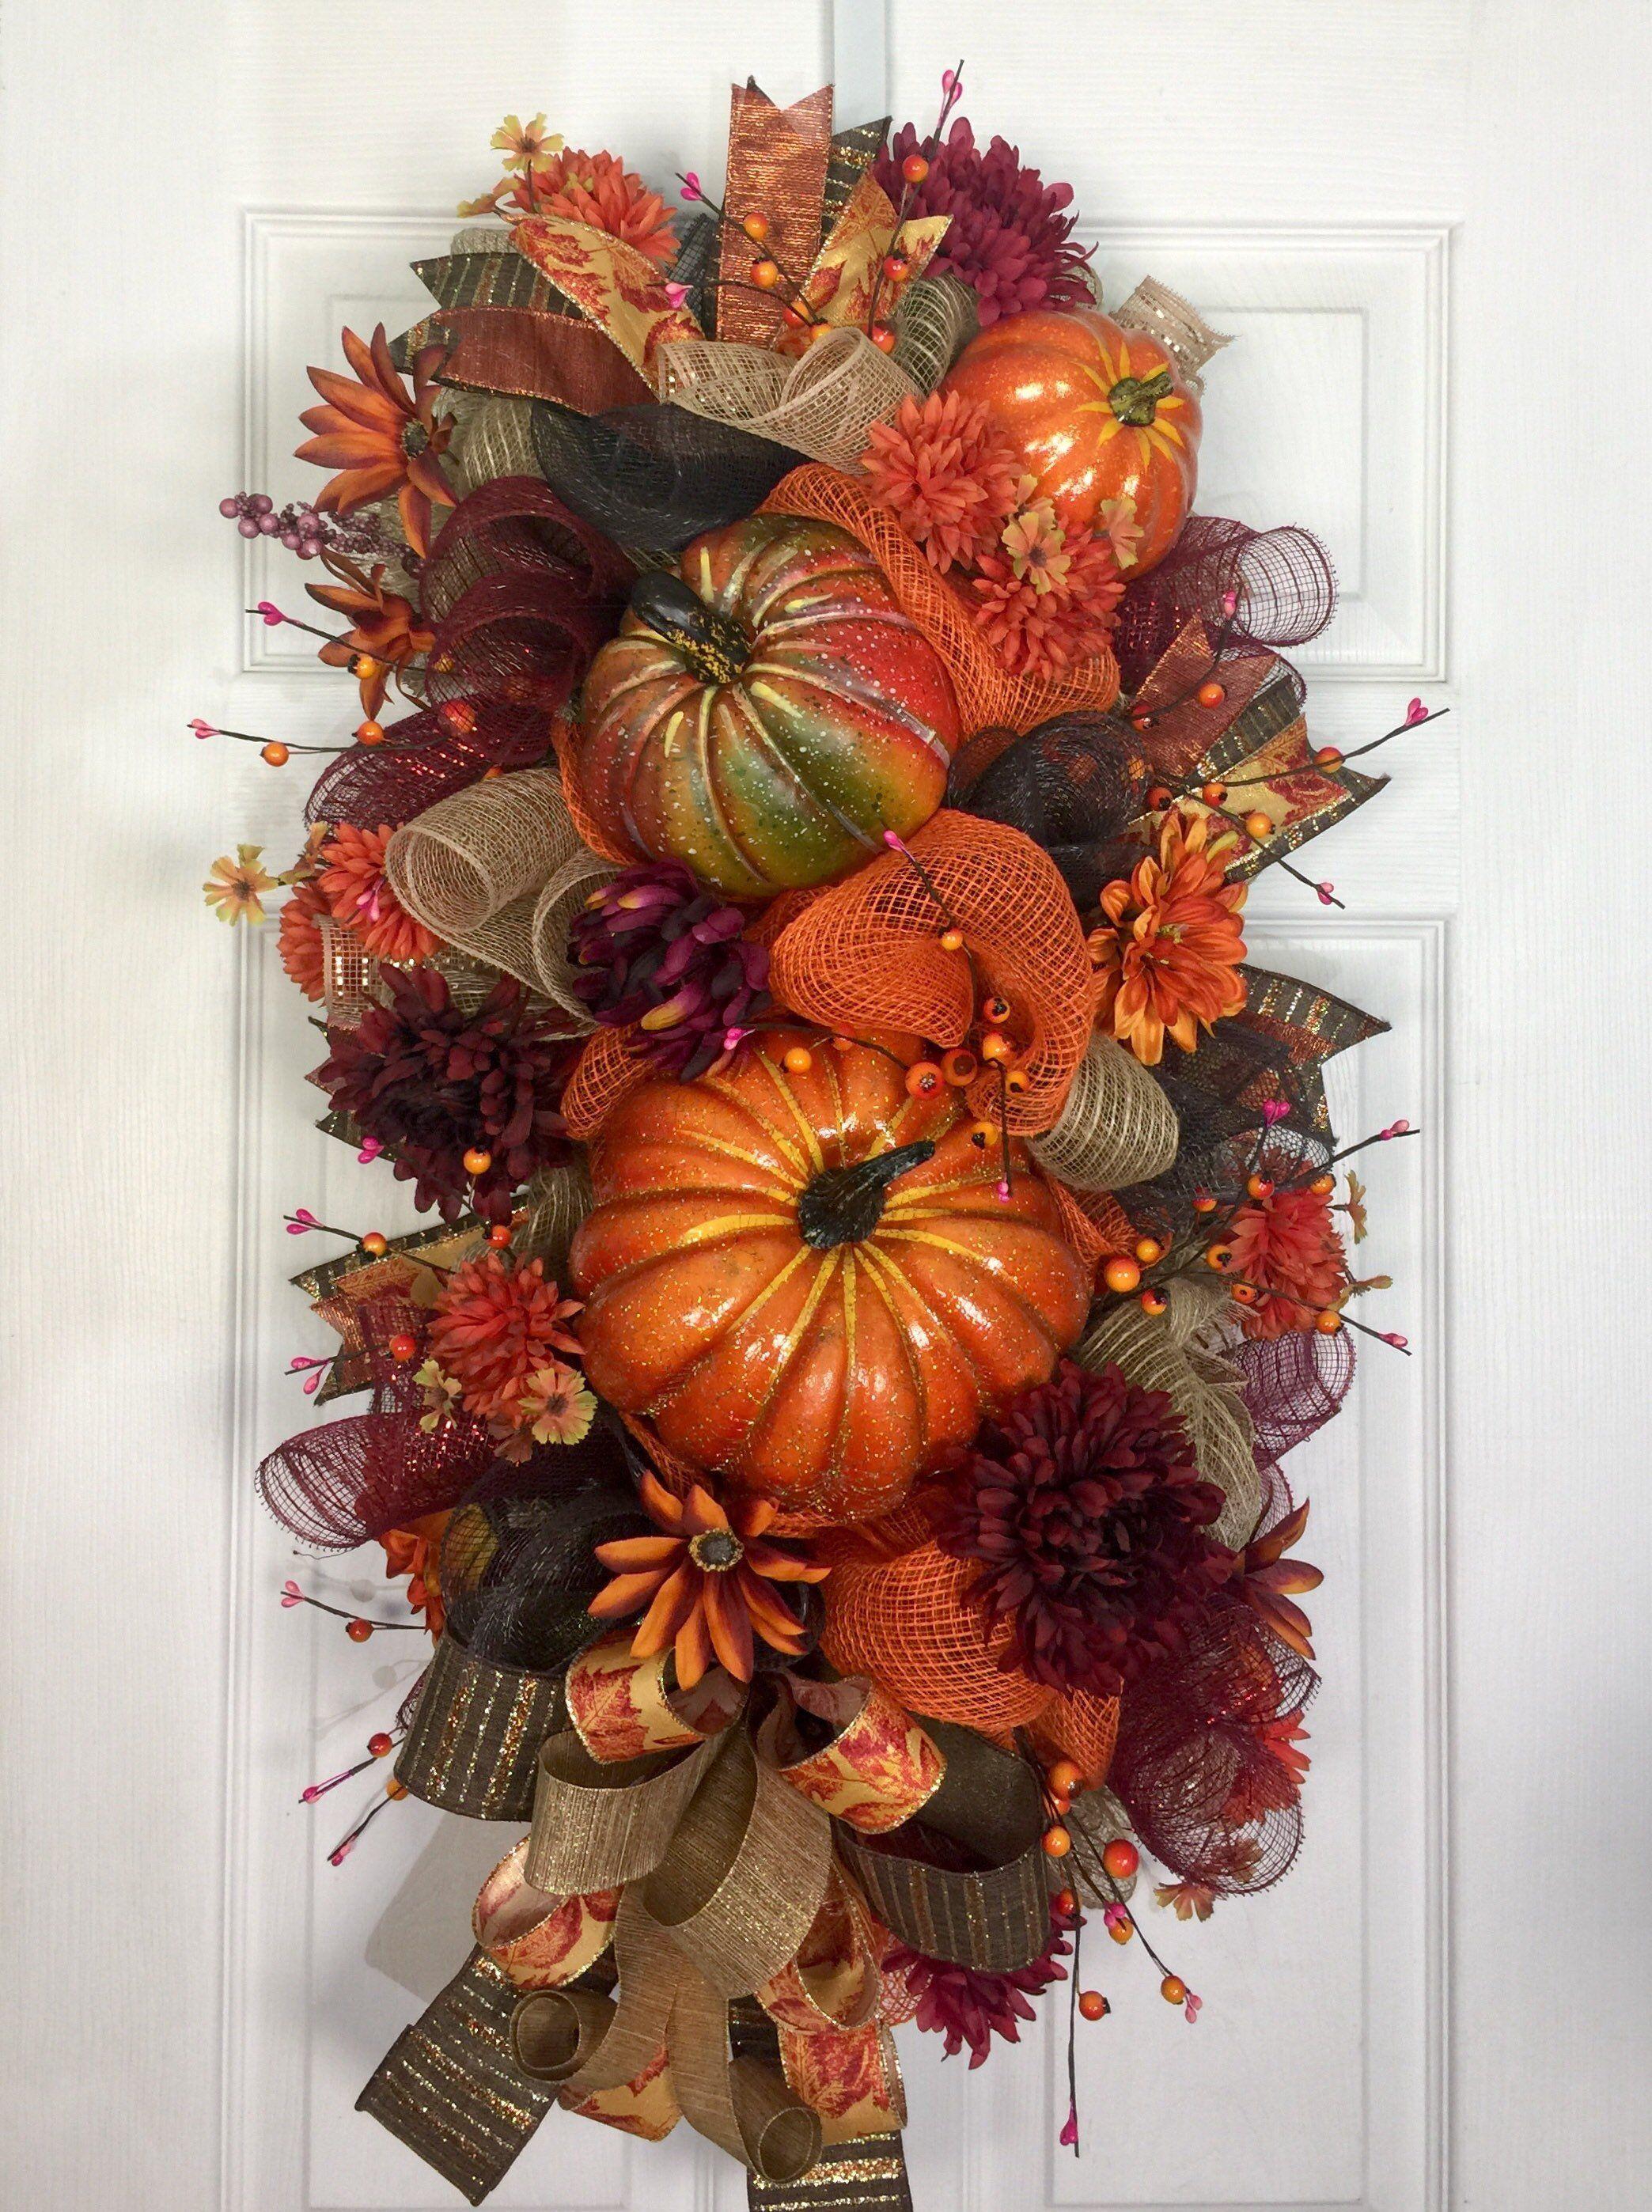 Fall Wreath Pumpkin Wreath Front Door Decor Fall Door Hanger Wreath With Pumpkins Harves Fall Decorations Porch Fall Halloween Decor Fall Deco Mesh Wreath